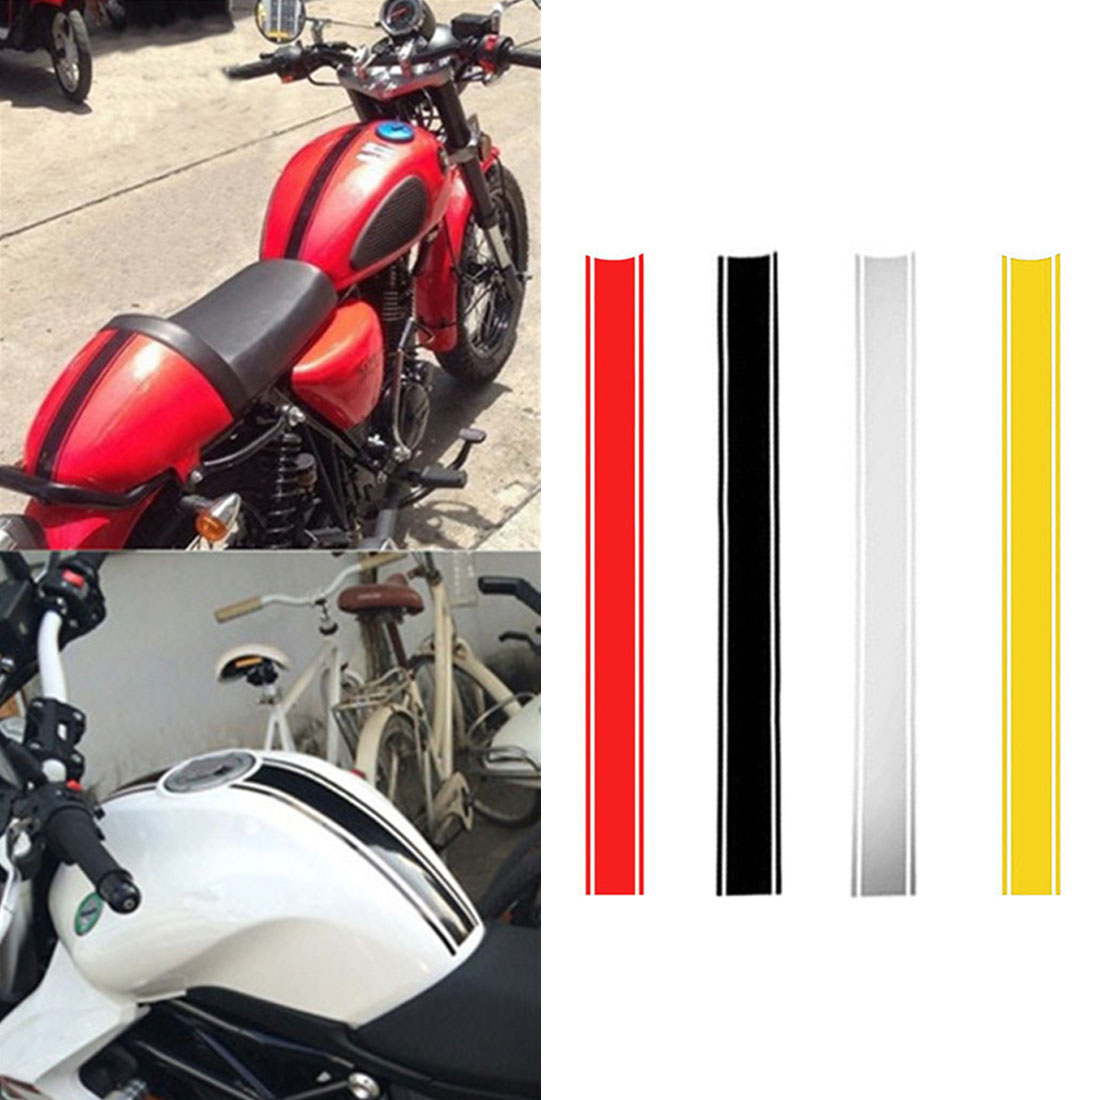 PEGATINAS DUCATI X2 vinilos Para coche moto etc